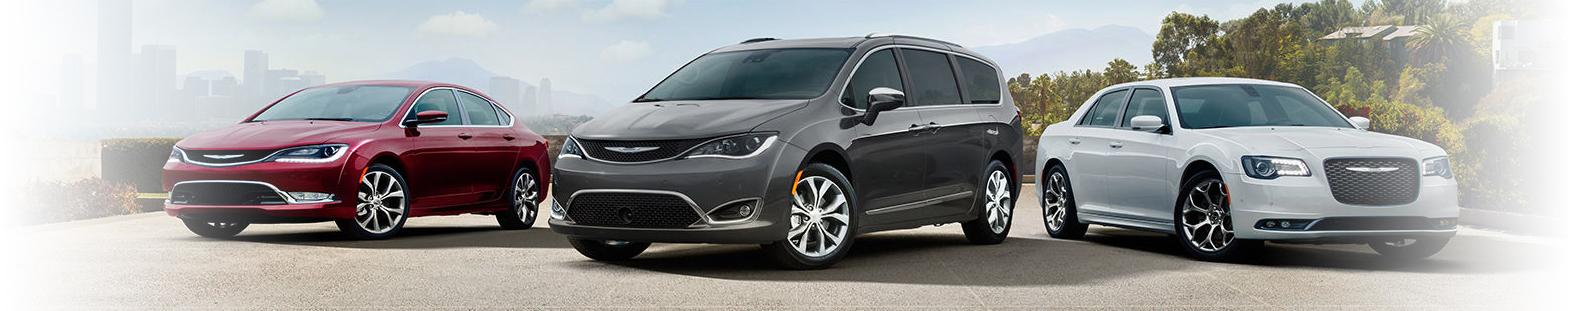 Henkel Auto | New And Used Cars | Battle Creek, MI